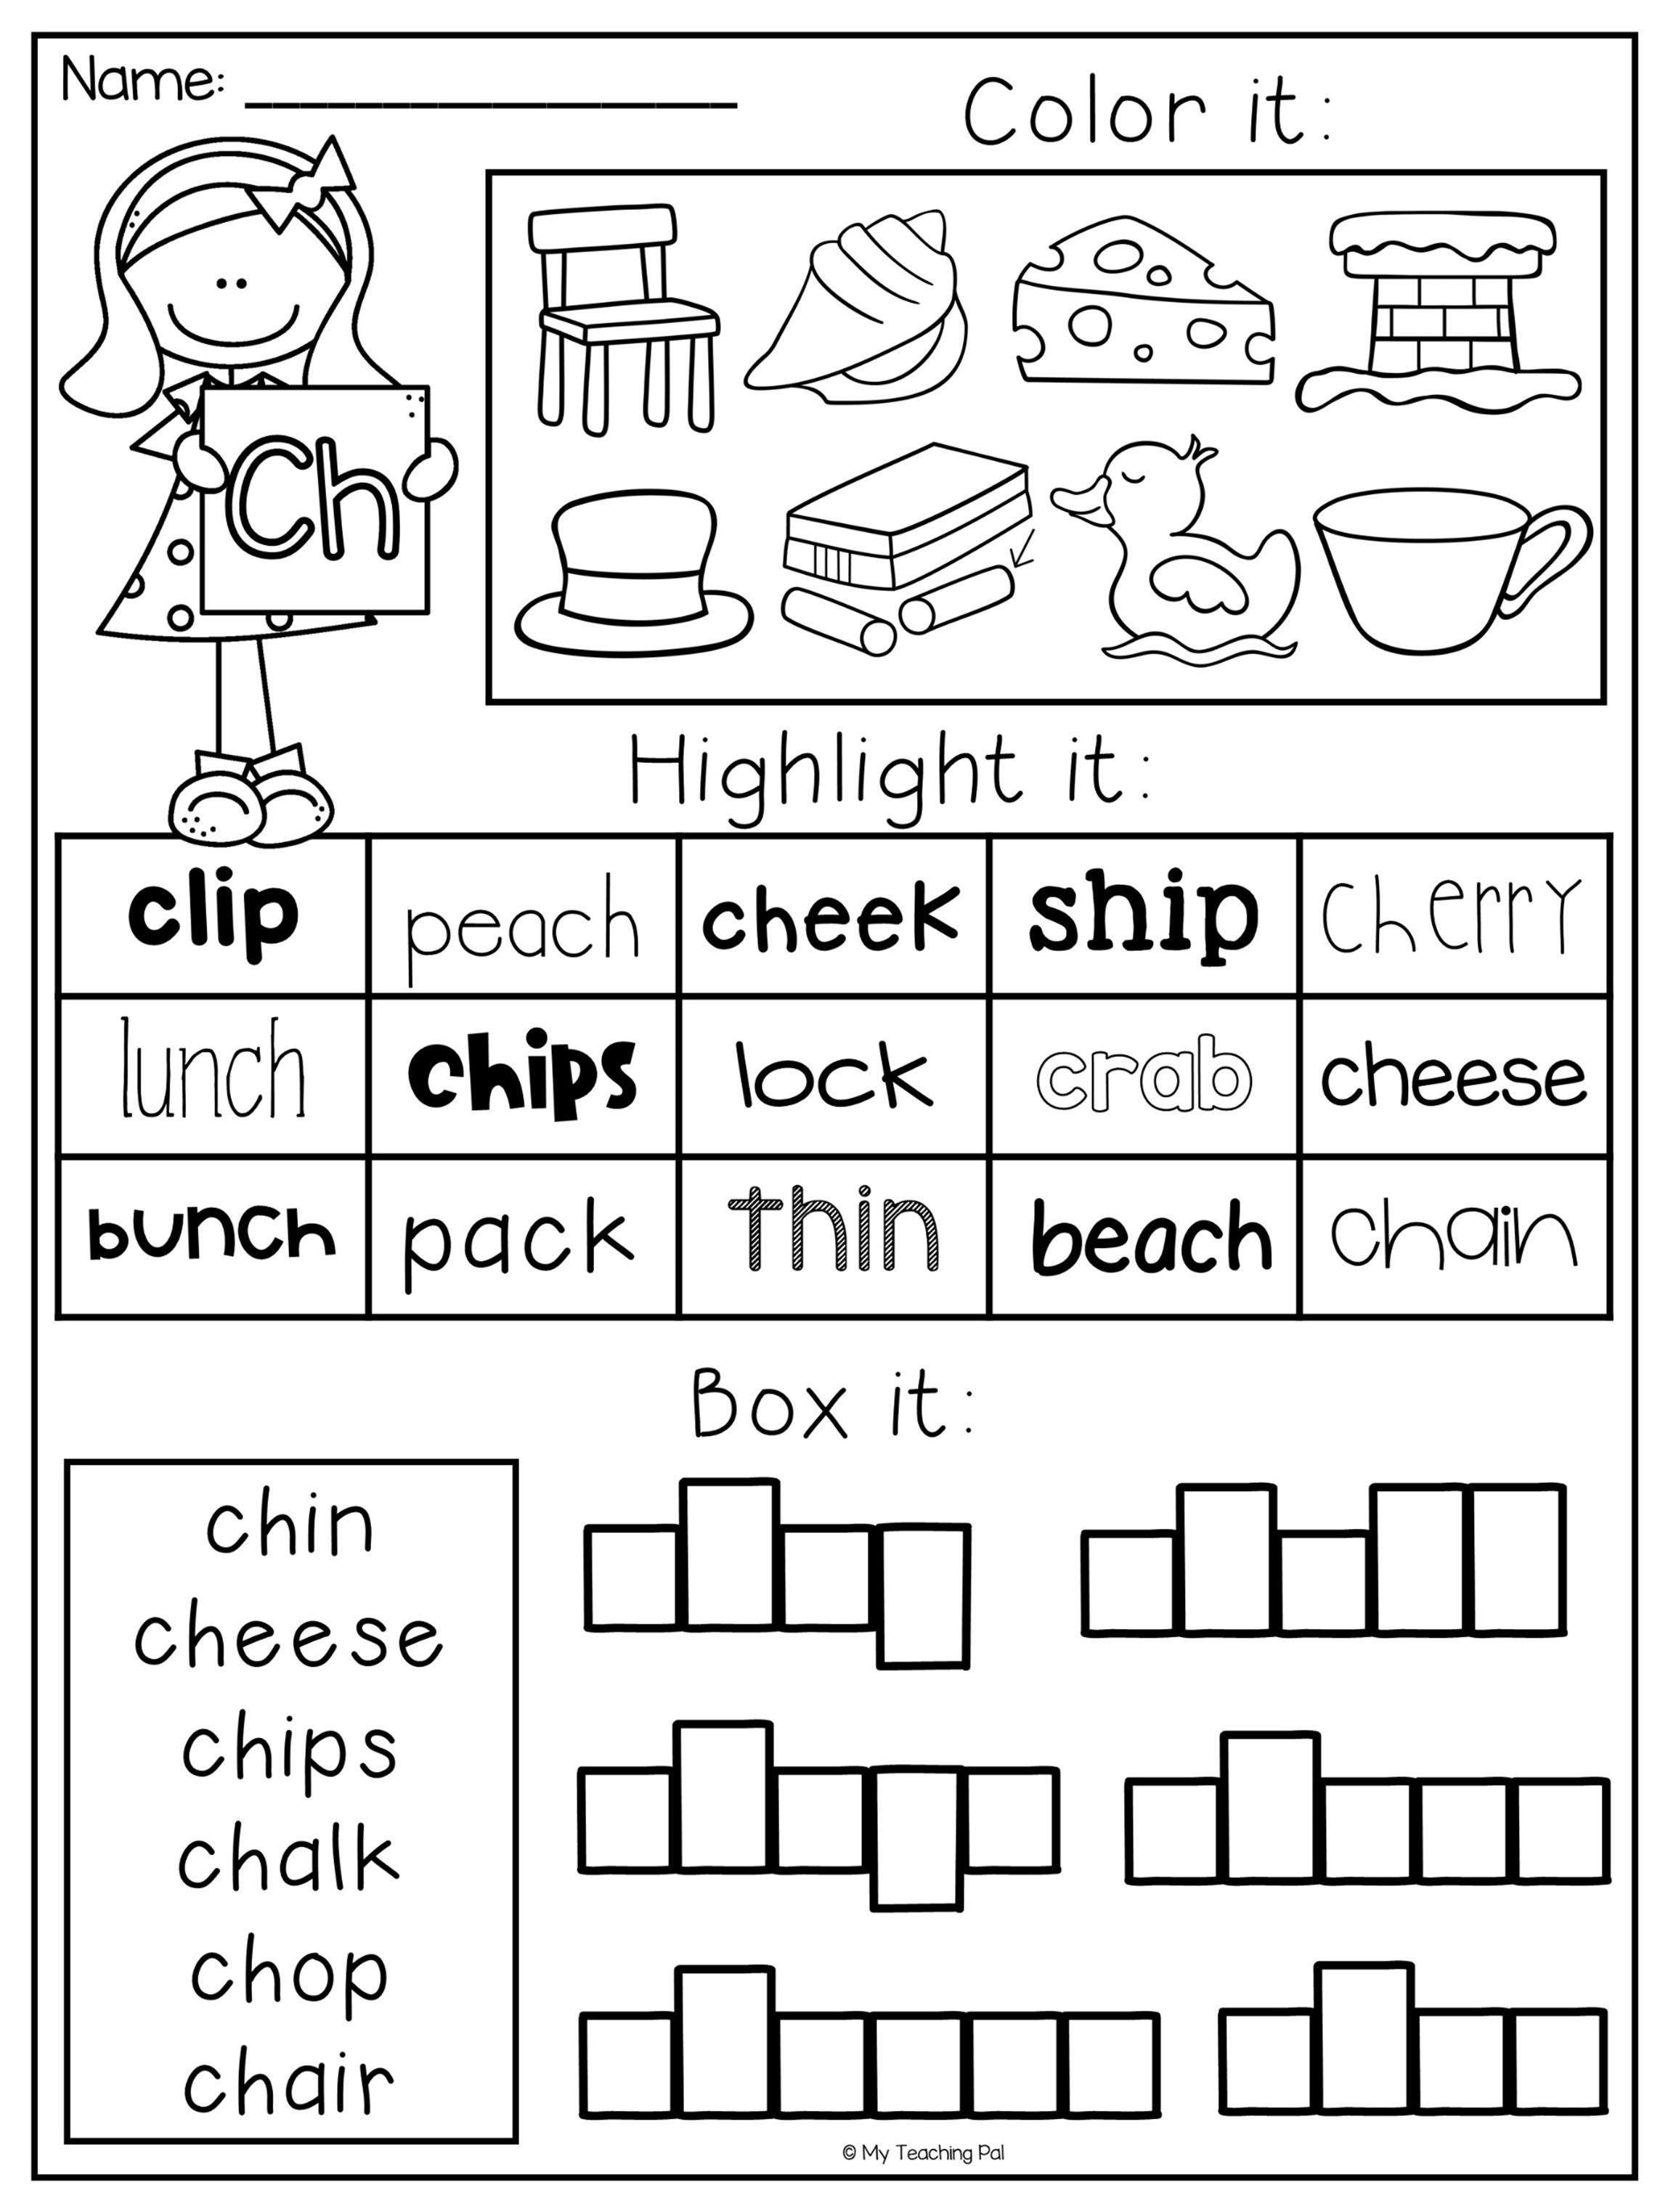 Digraph Worksheet Packet - Ch, Sh, Th, Wh, Ph | Educational - Sh Worksheets Free Printable